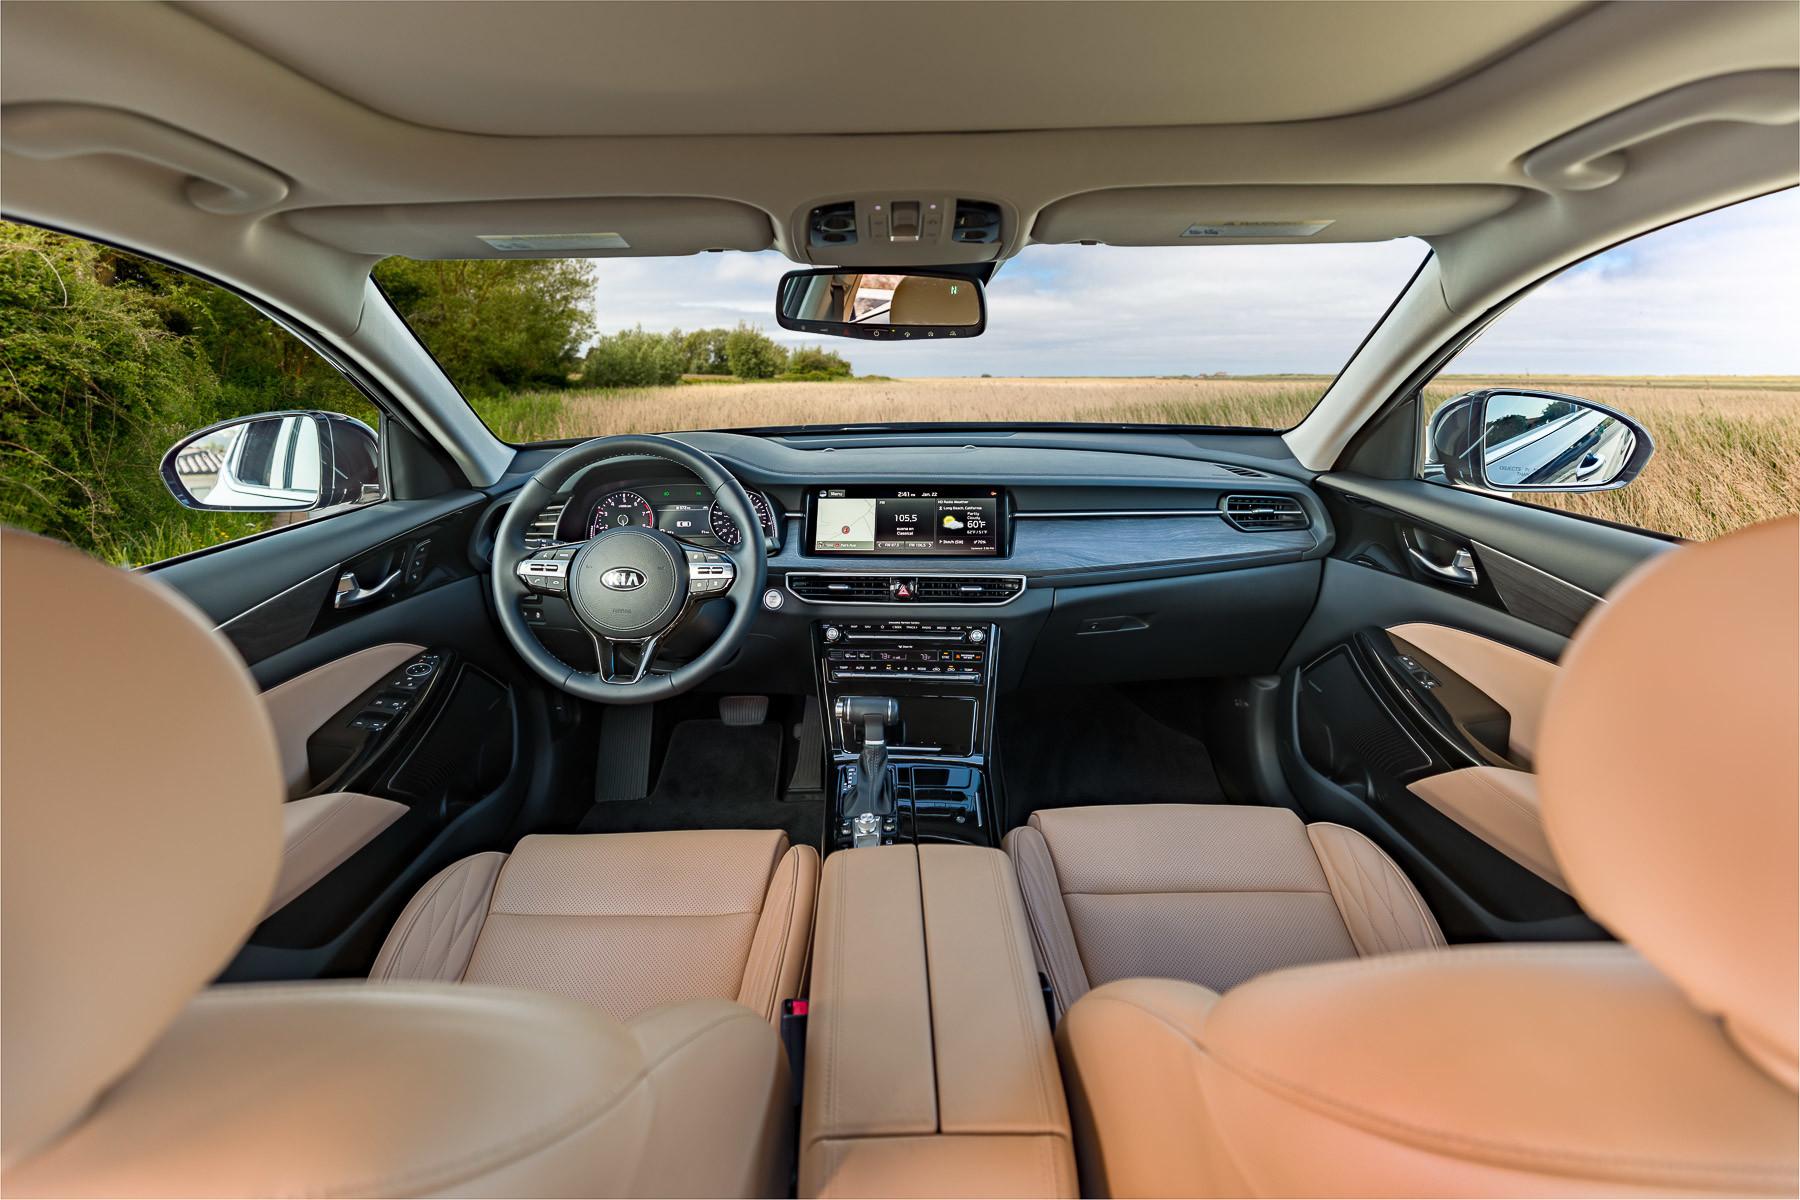 kia-cadenza-2020-01-cockpit-shot--front-row--interior.jpg